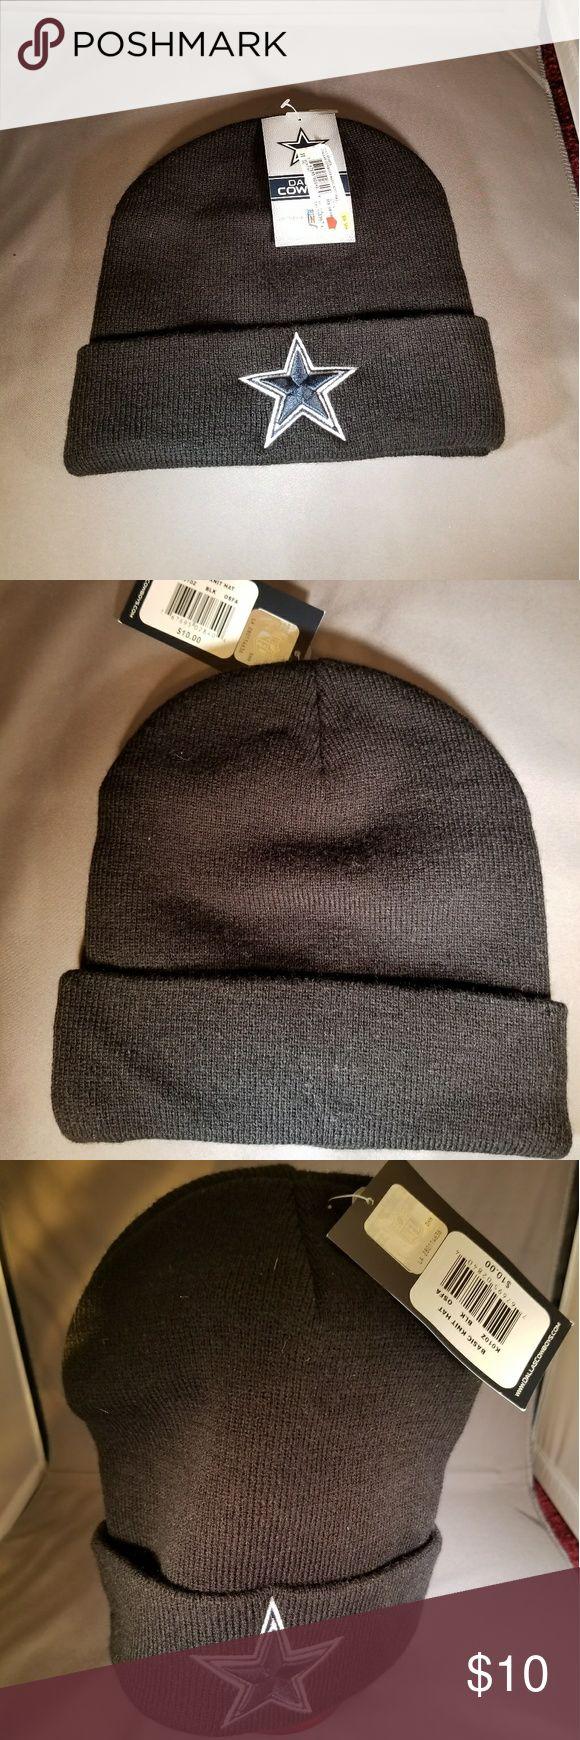 NFL  Dallas Cowboys knit hat - BLACK NWT - Never Worn.  Black DALLAS COWBOY Basic Knit Hat. Star color is Navy.  Smoke Free Home Dallas cowboys Other